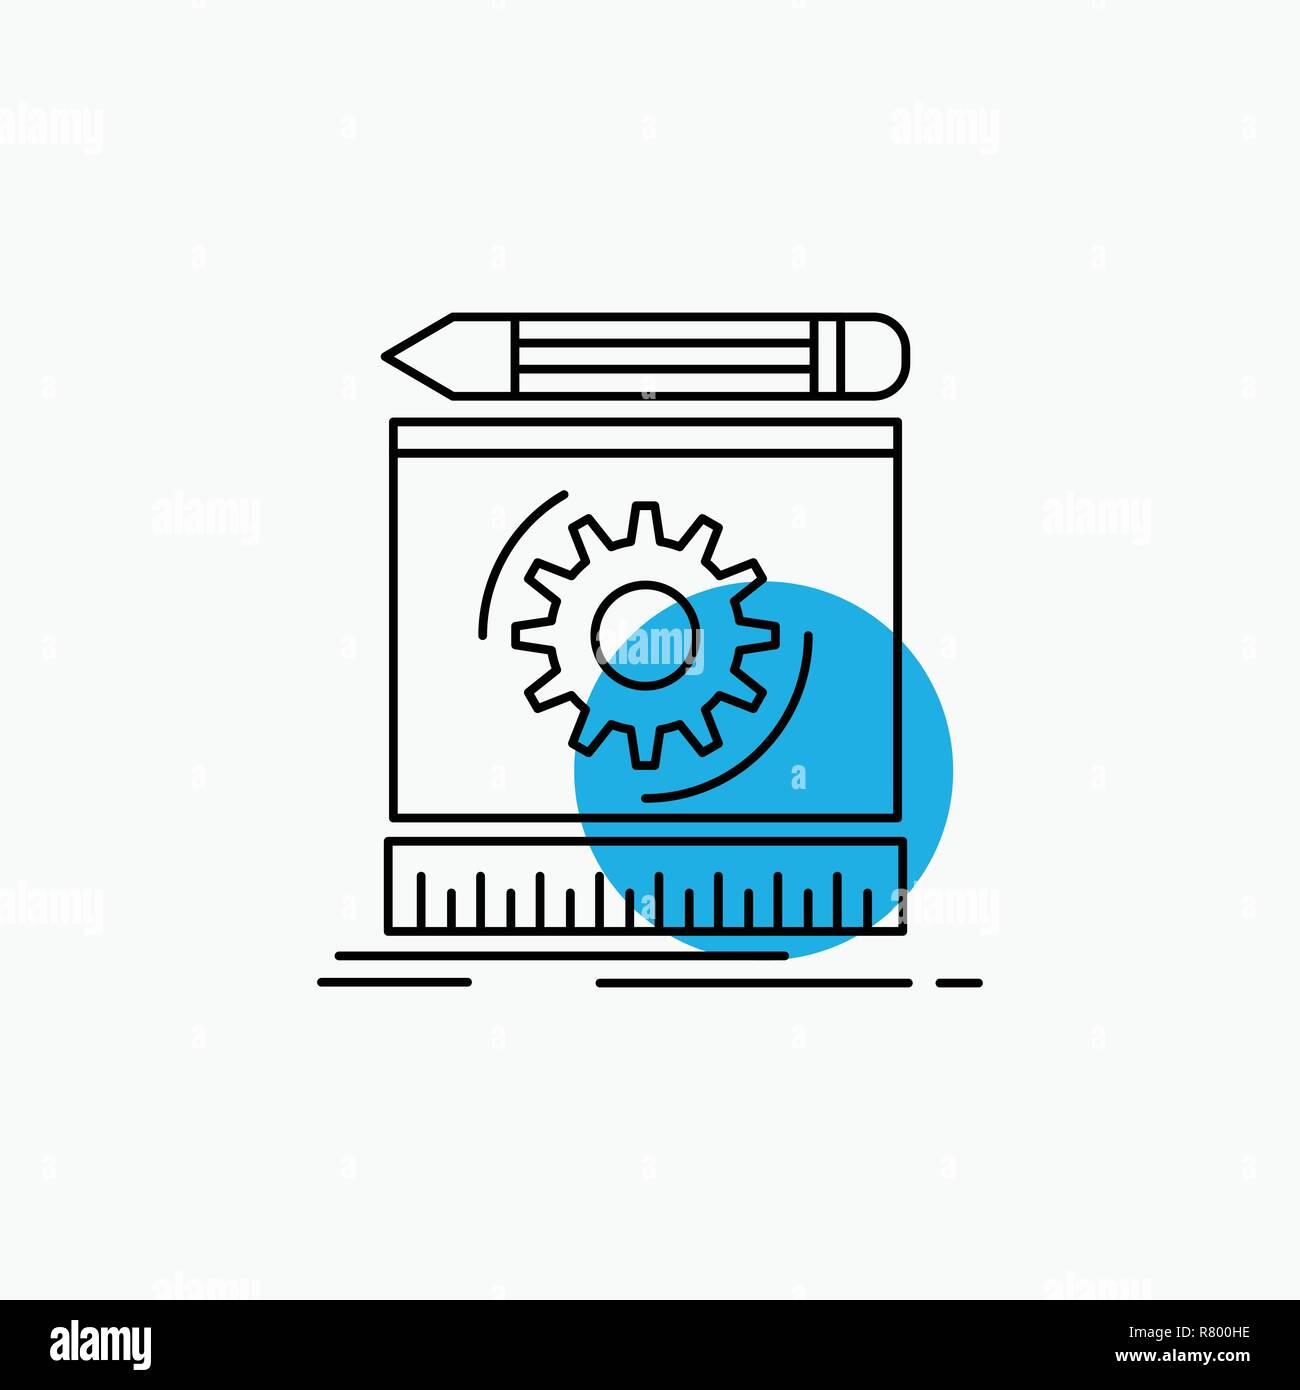 Draft, engineering, process, prototype, prototyping Line Icon - Stock Vector